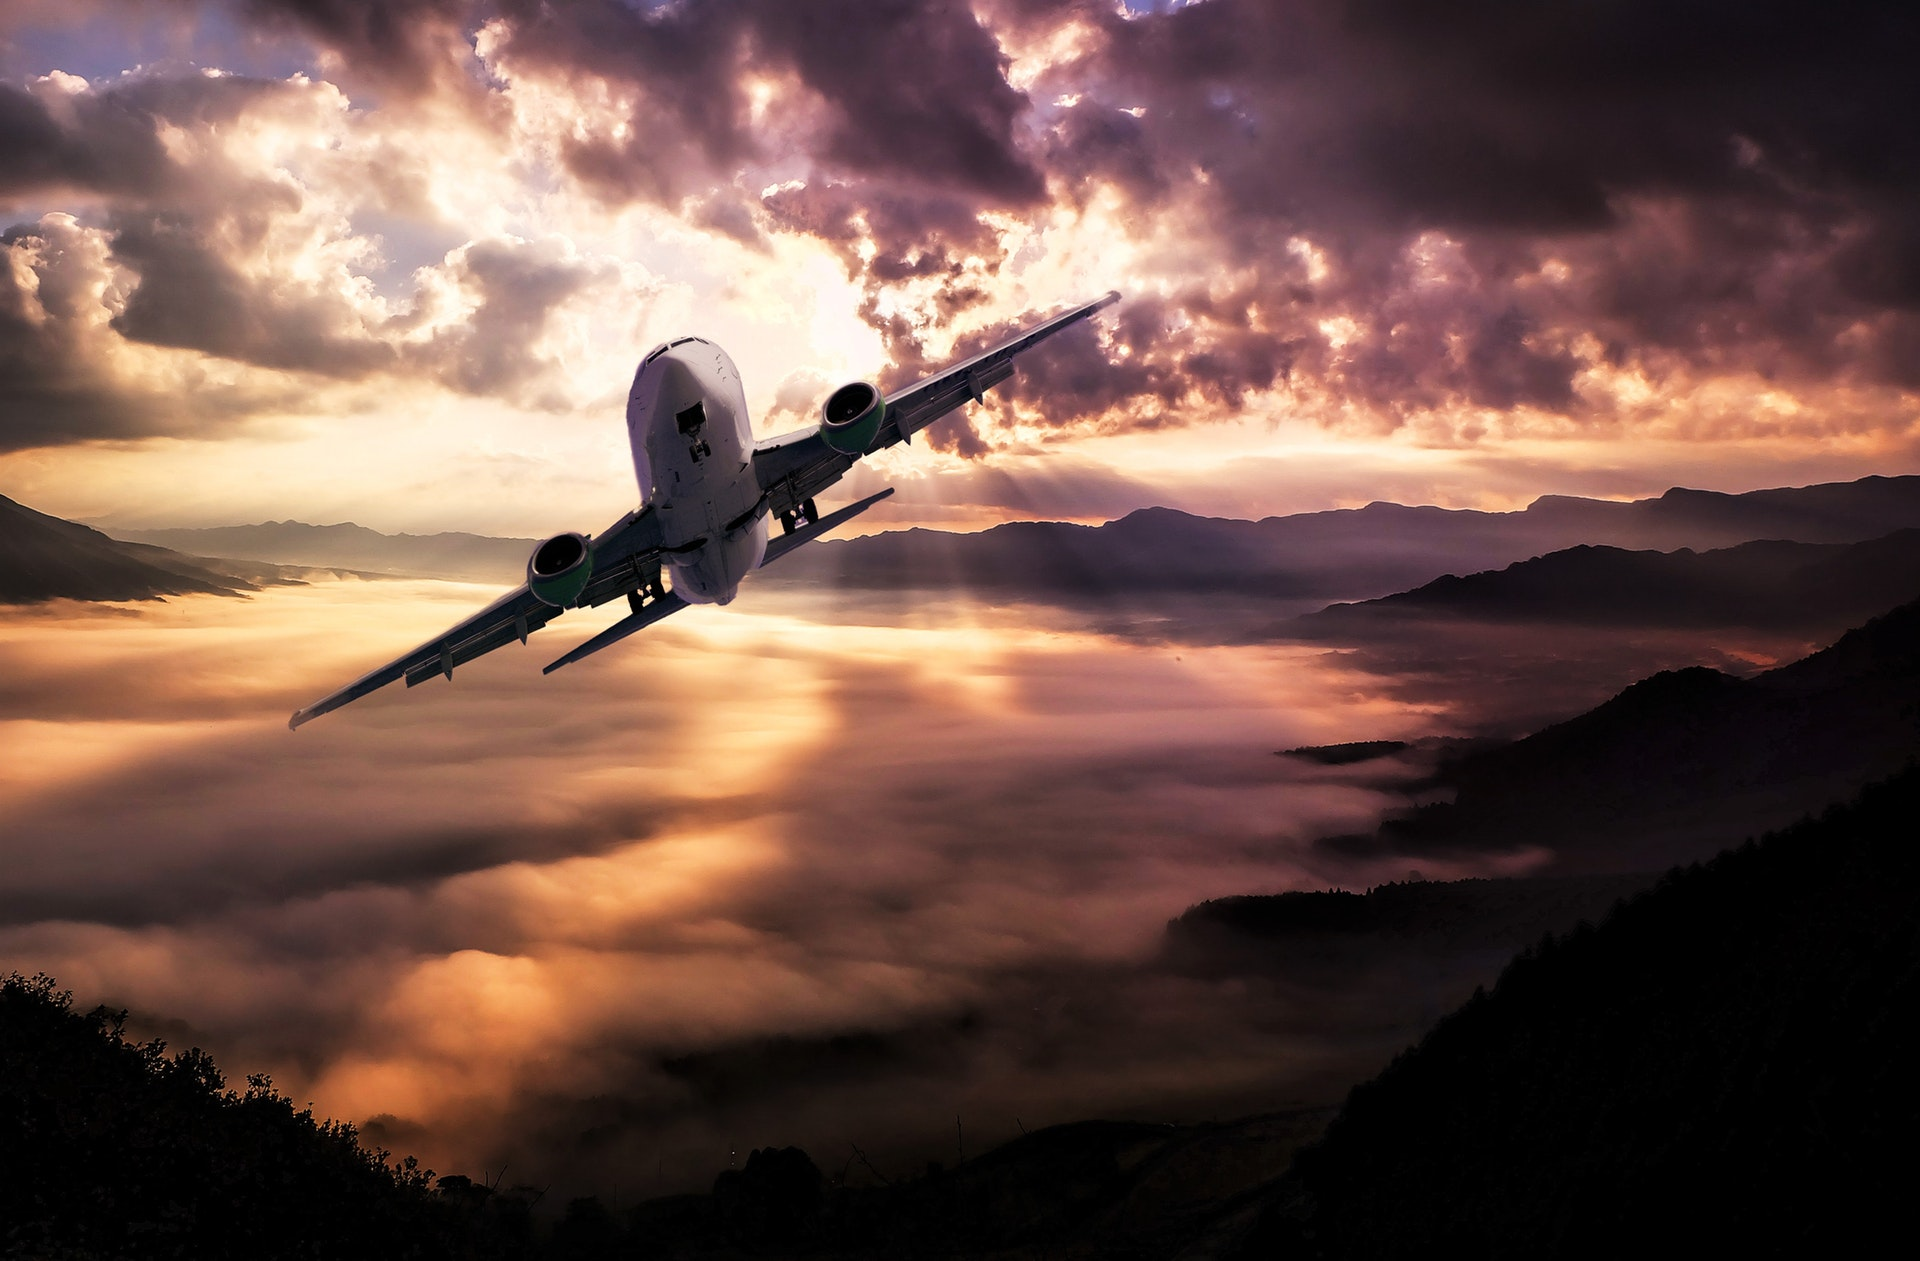 olivier jollin - aeroplane